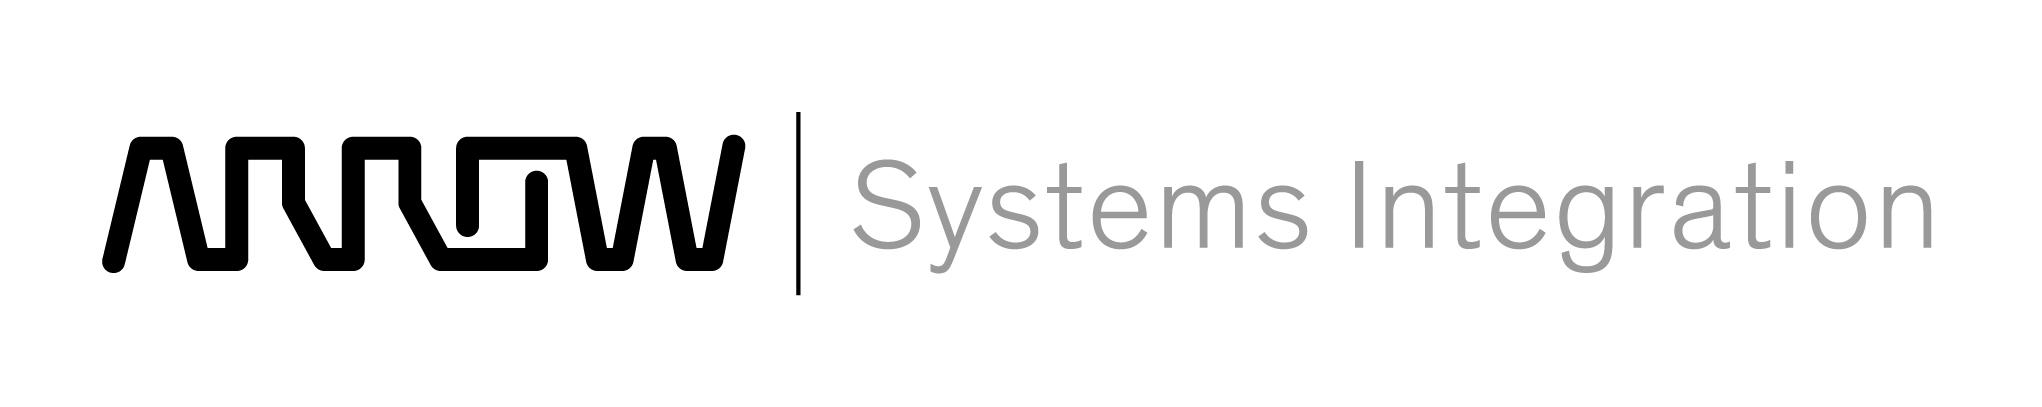 Arrow Systems Integration logo